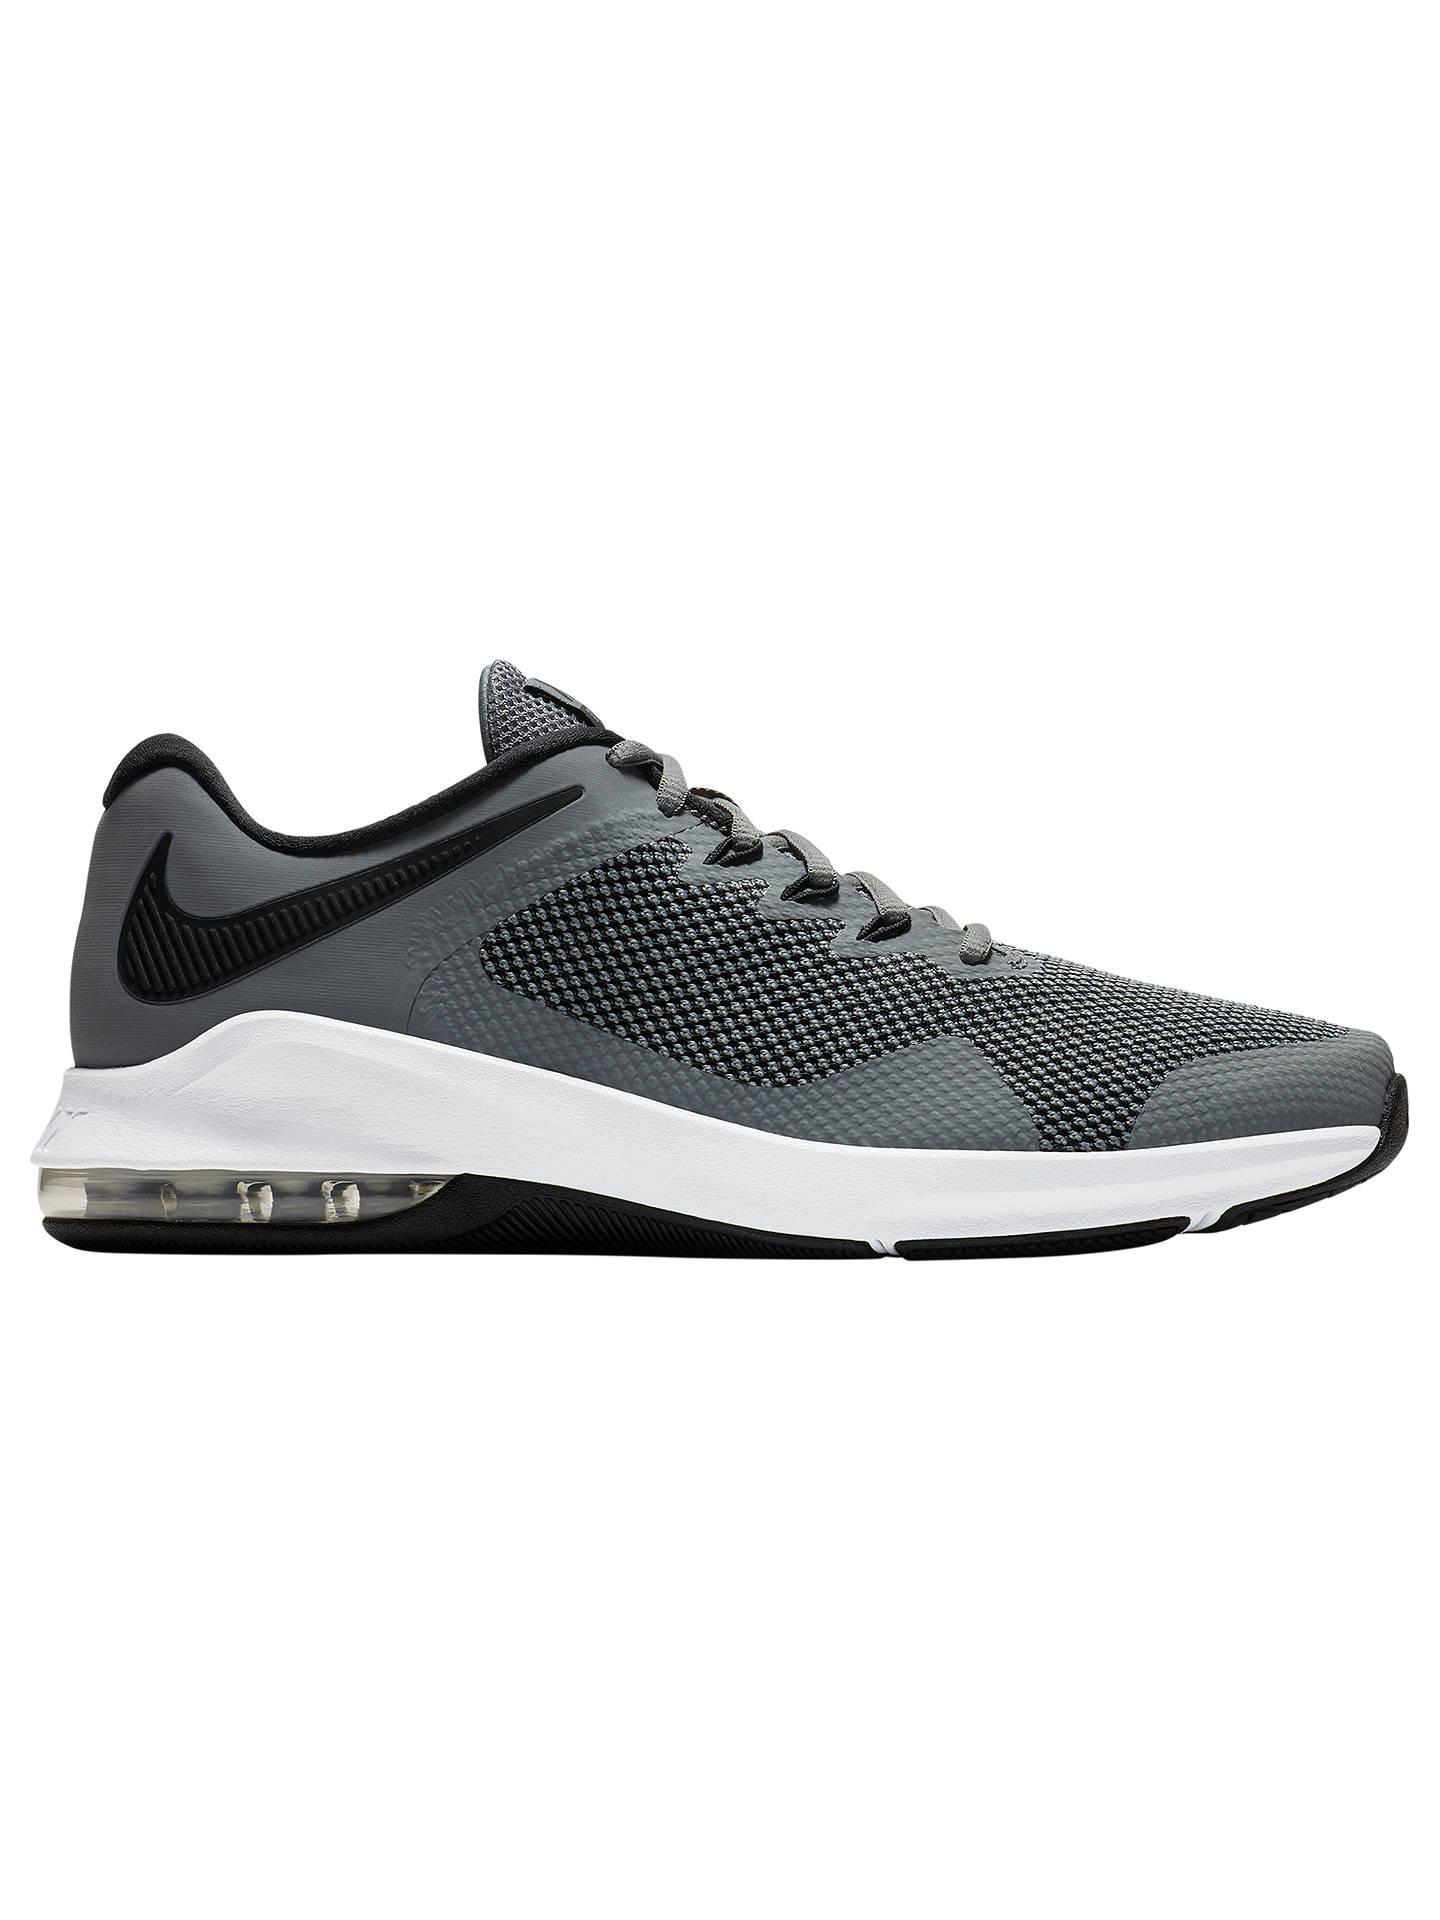 9d208f0ea8b5 Buy Nike Air Max Alpha Men s Training Shoes